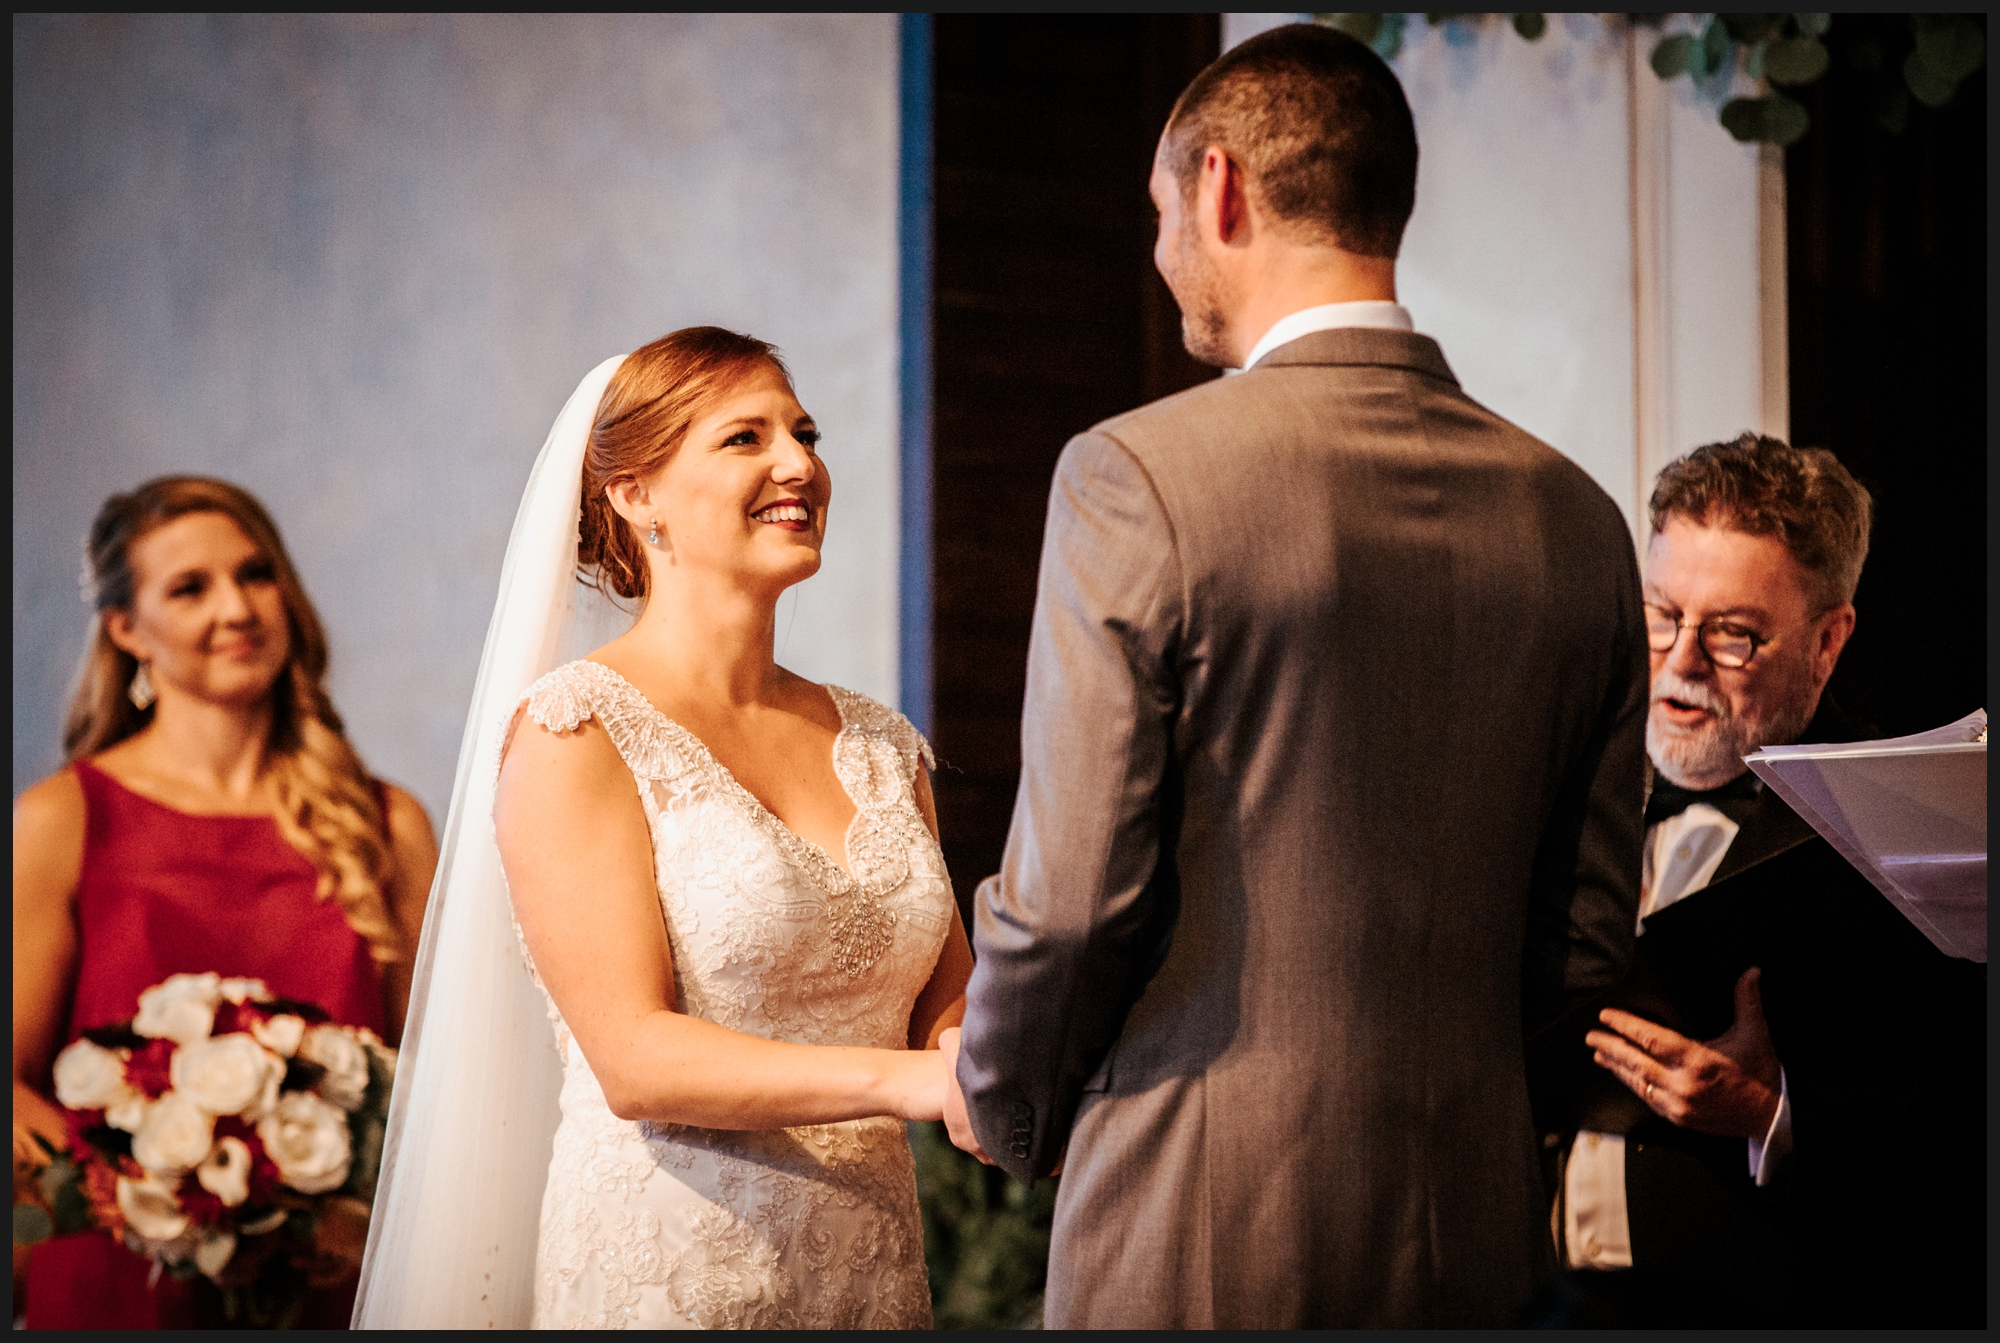 Orlando-Wedding-Photographer-destination-wedding-photographer-florida-wedding-photographer-bohemian-wedding-photographer_0627.jpg